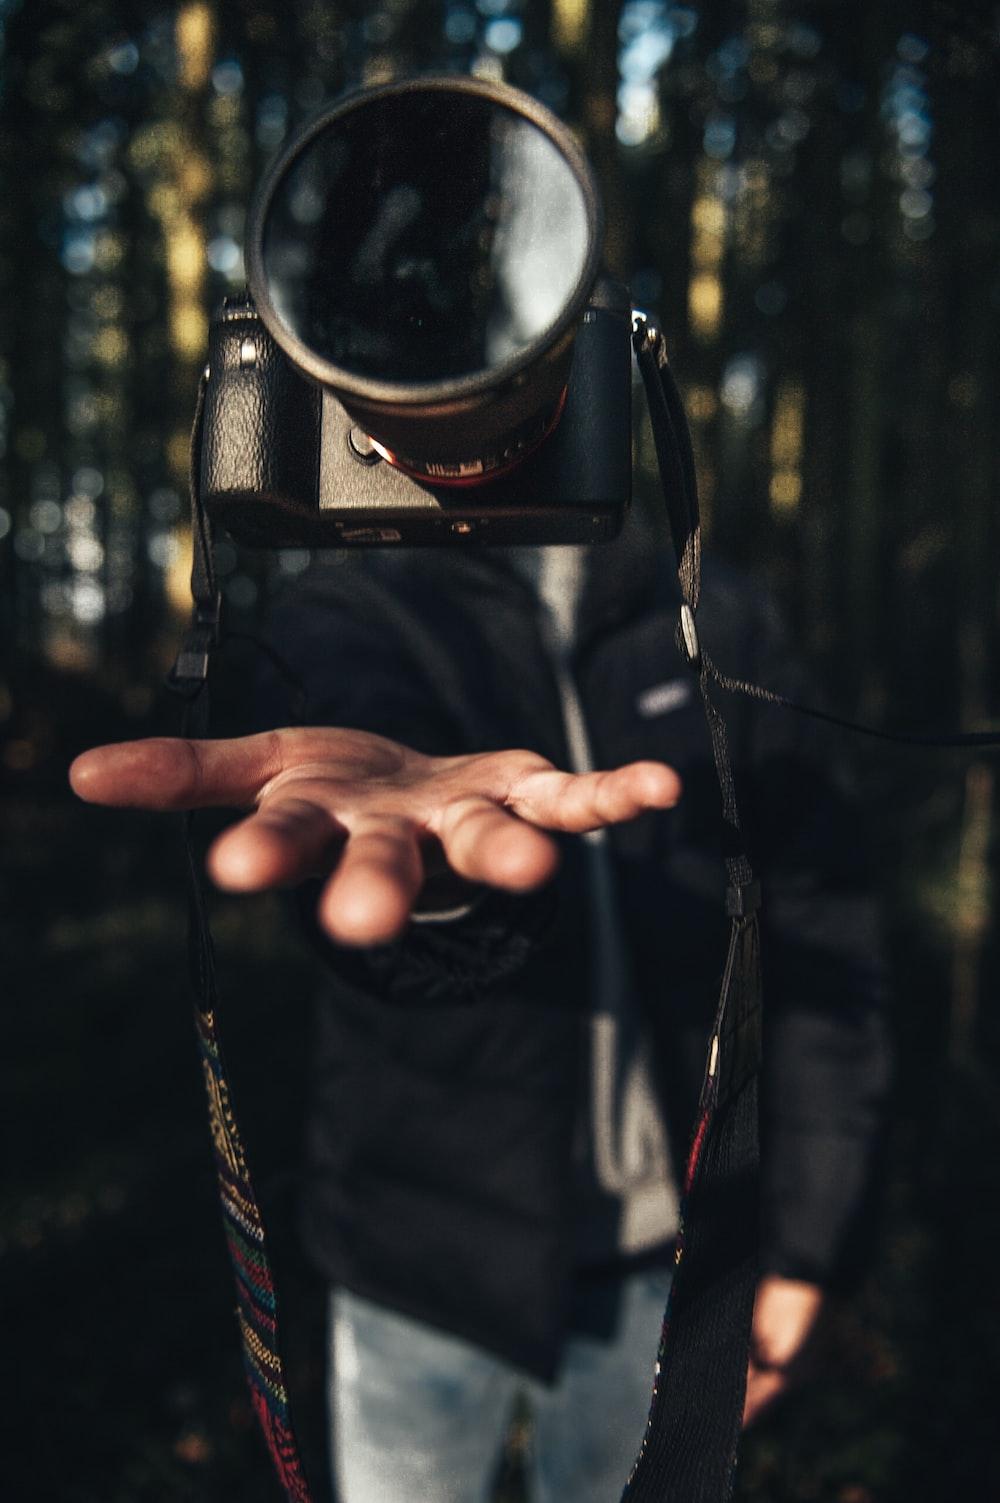 hanging black DSLR camera photography